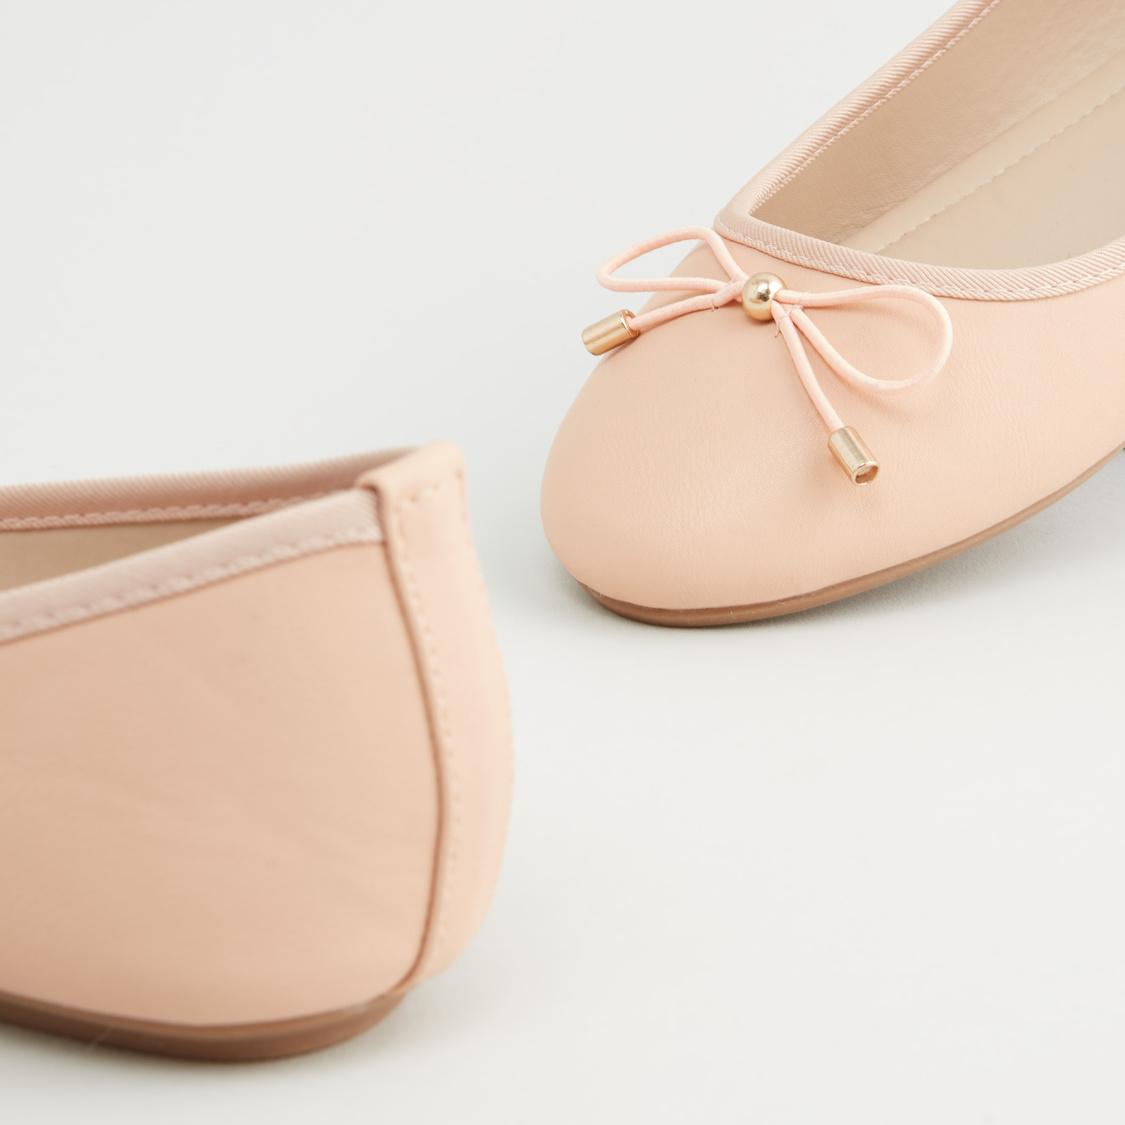 Plain Round Toe Ballerinas with Bow Applique